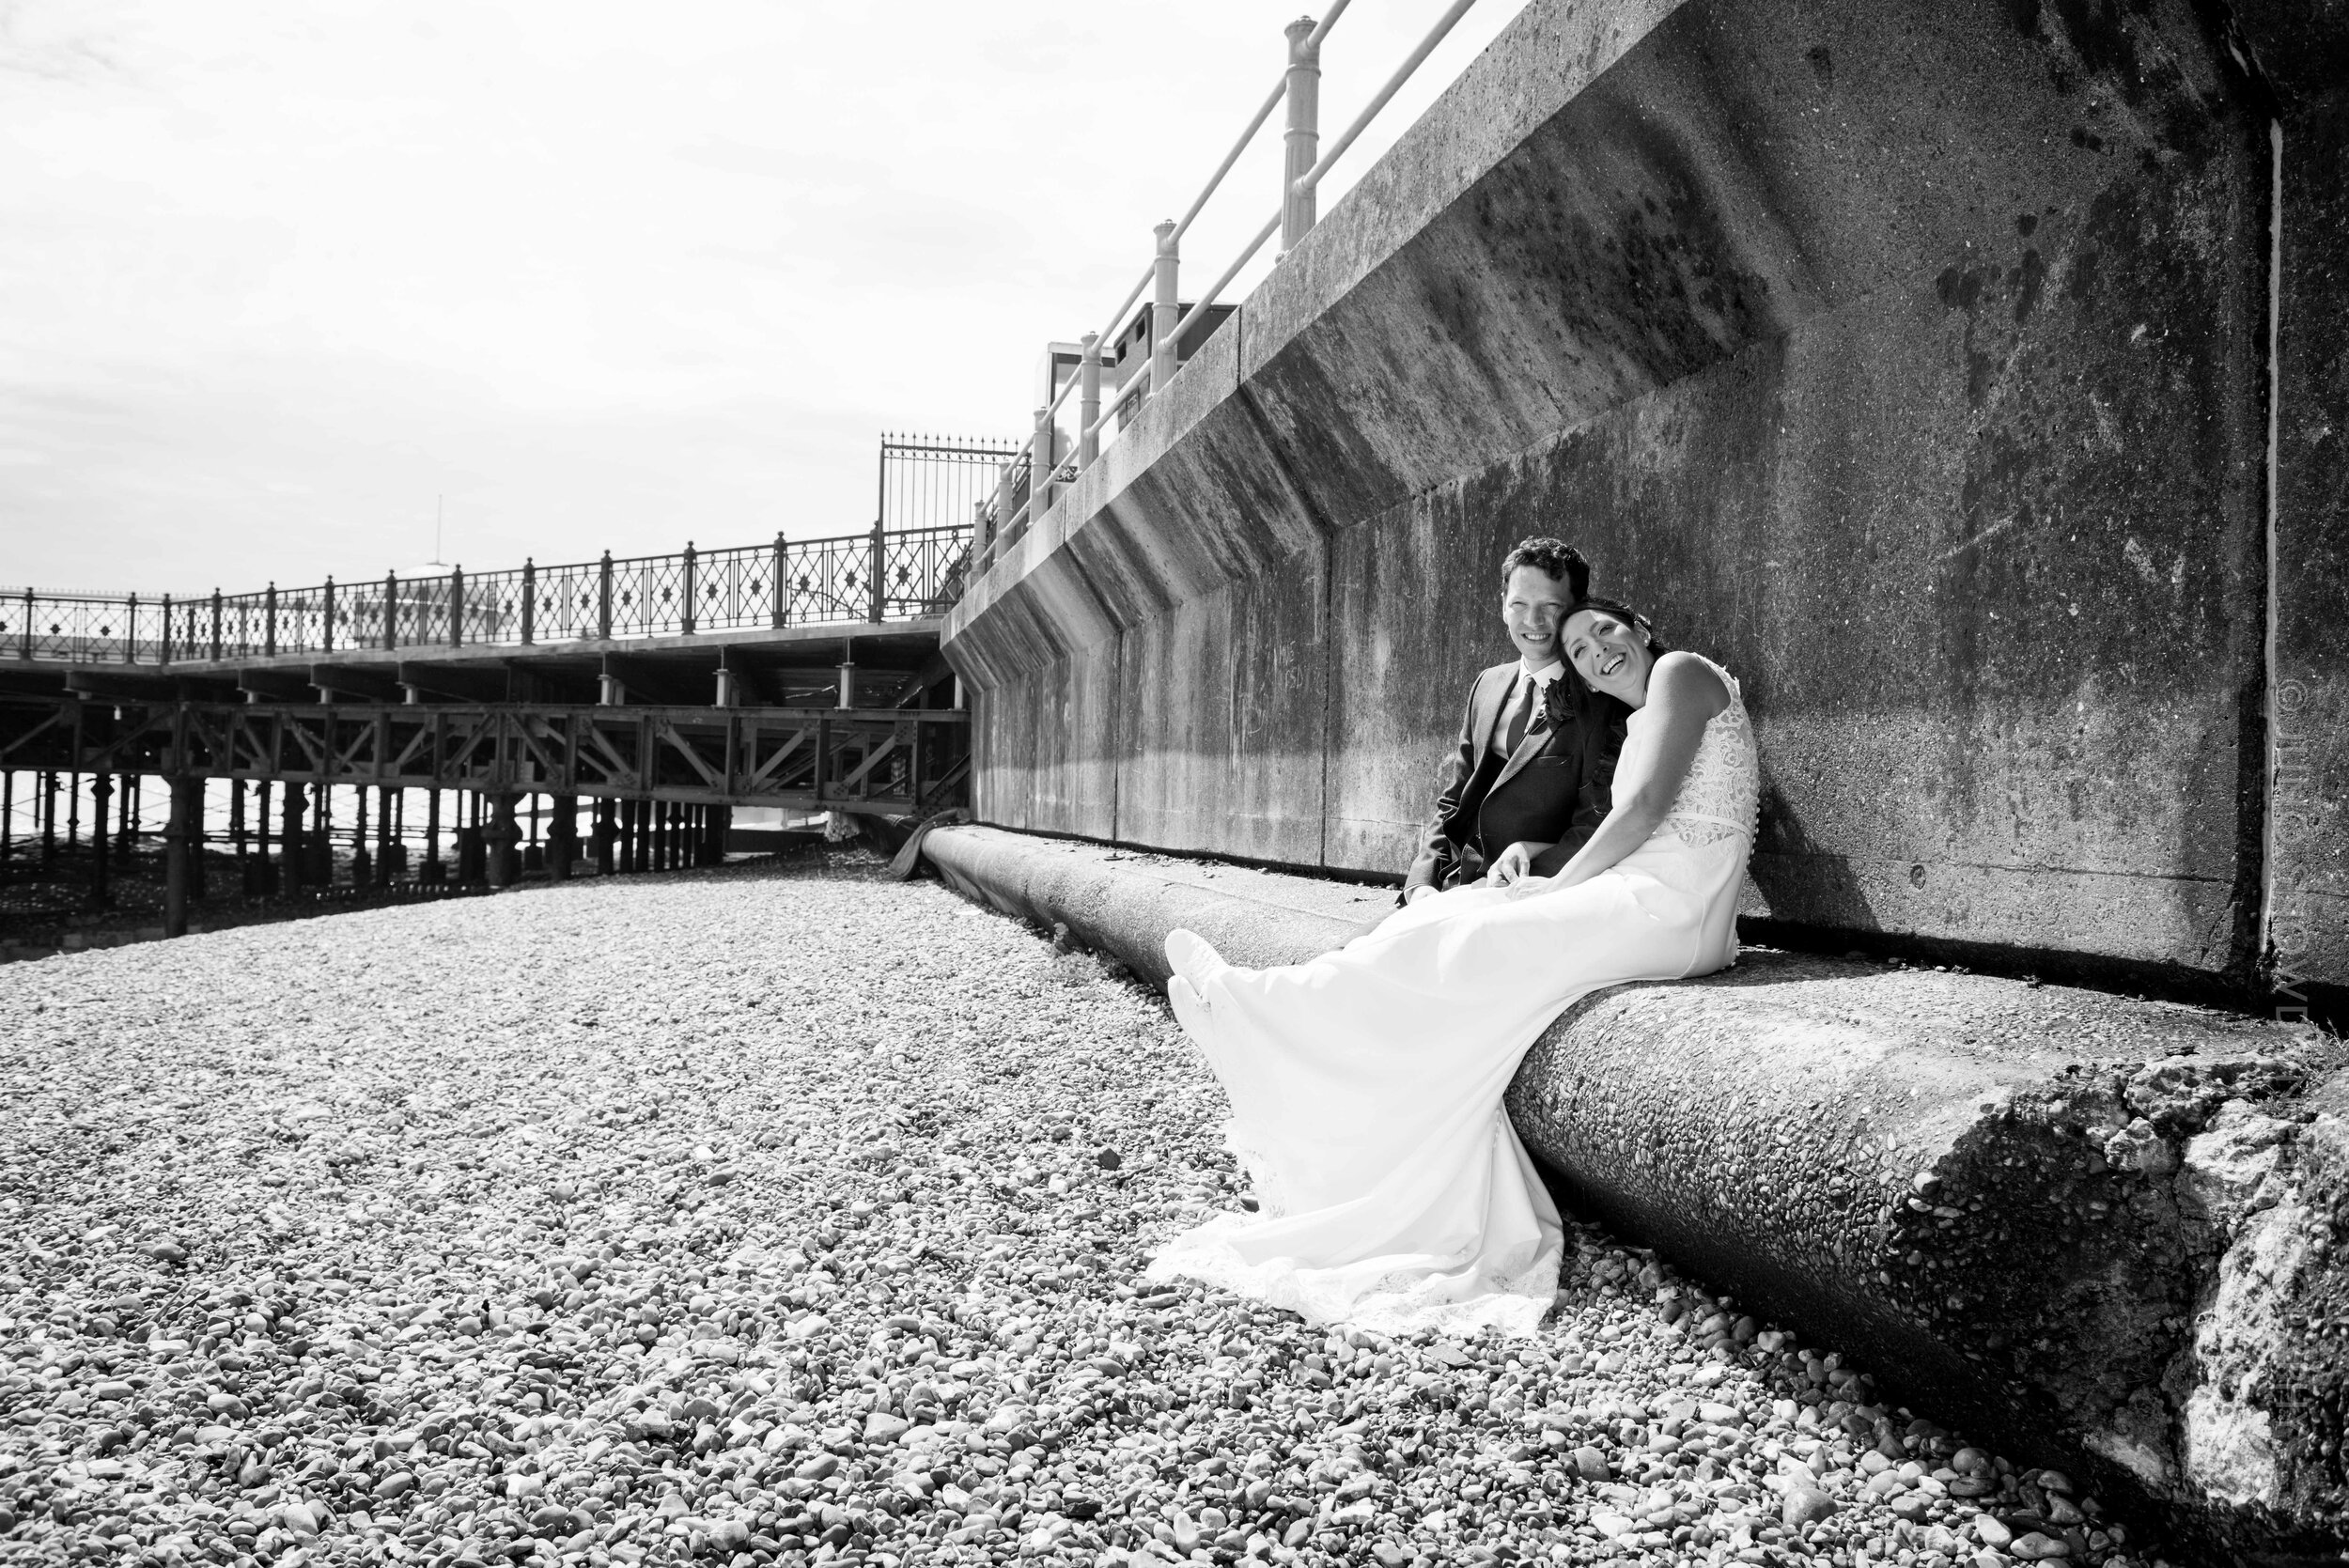 juno-snowdon-photography-wedding-7604.jpg